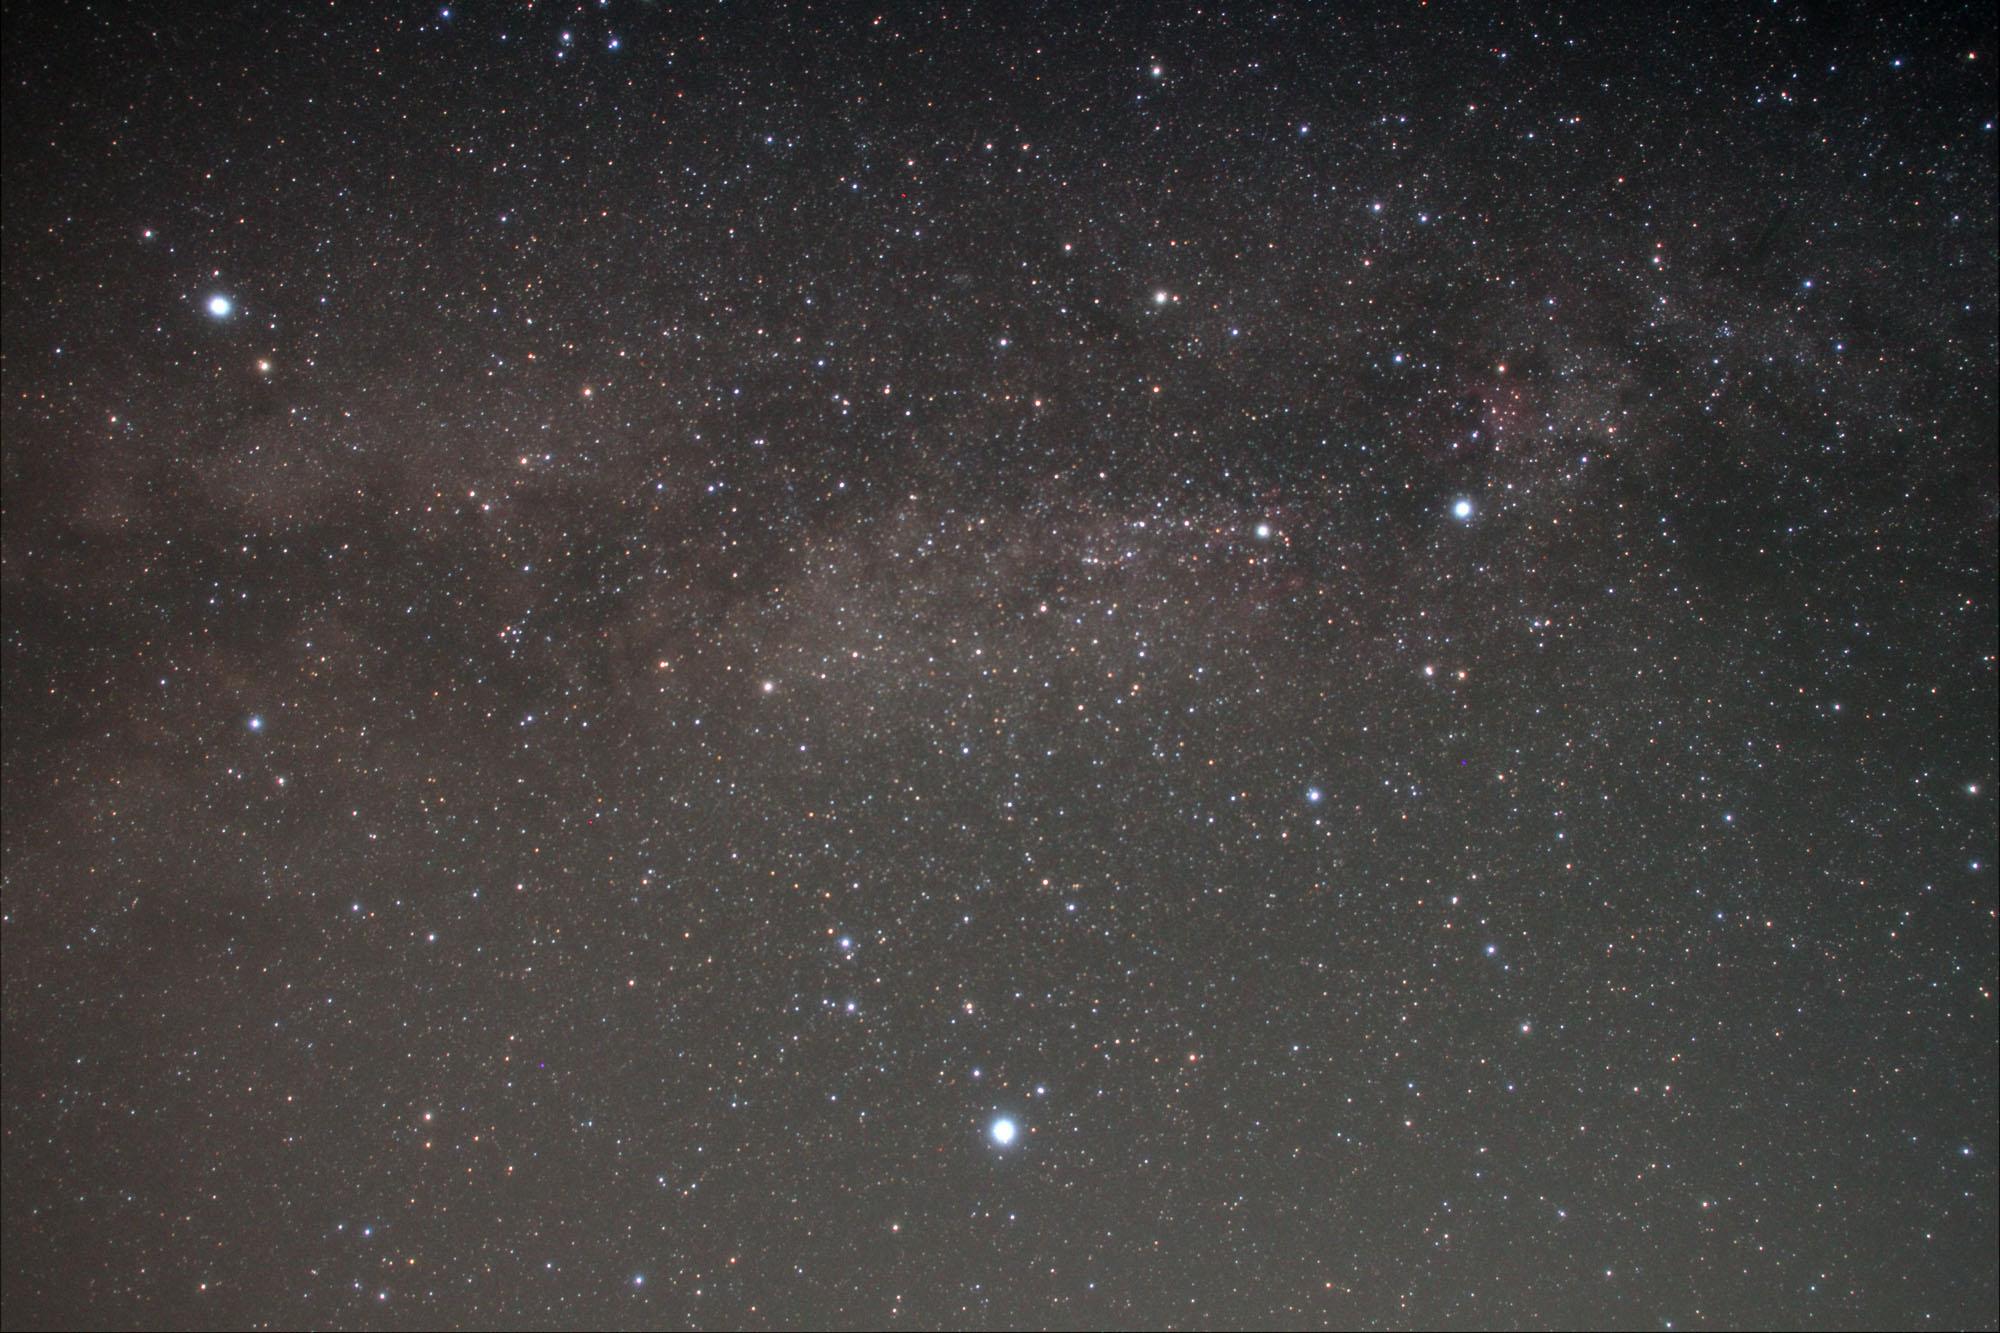 8月14日の星野写真_e0174091_16132211.jpg